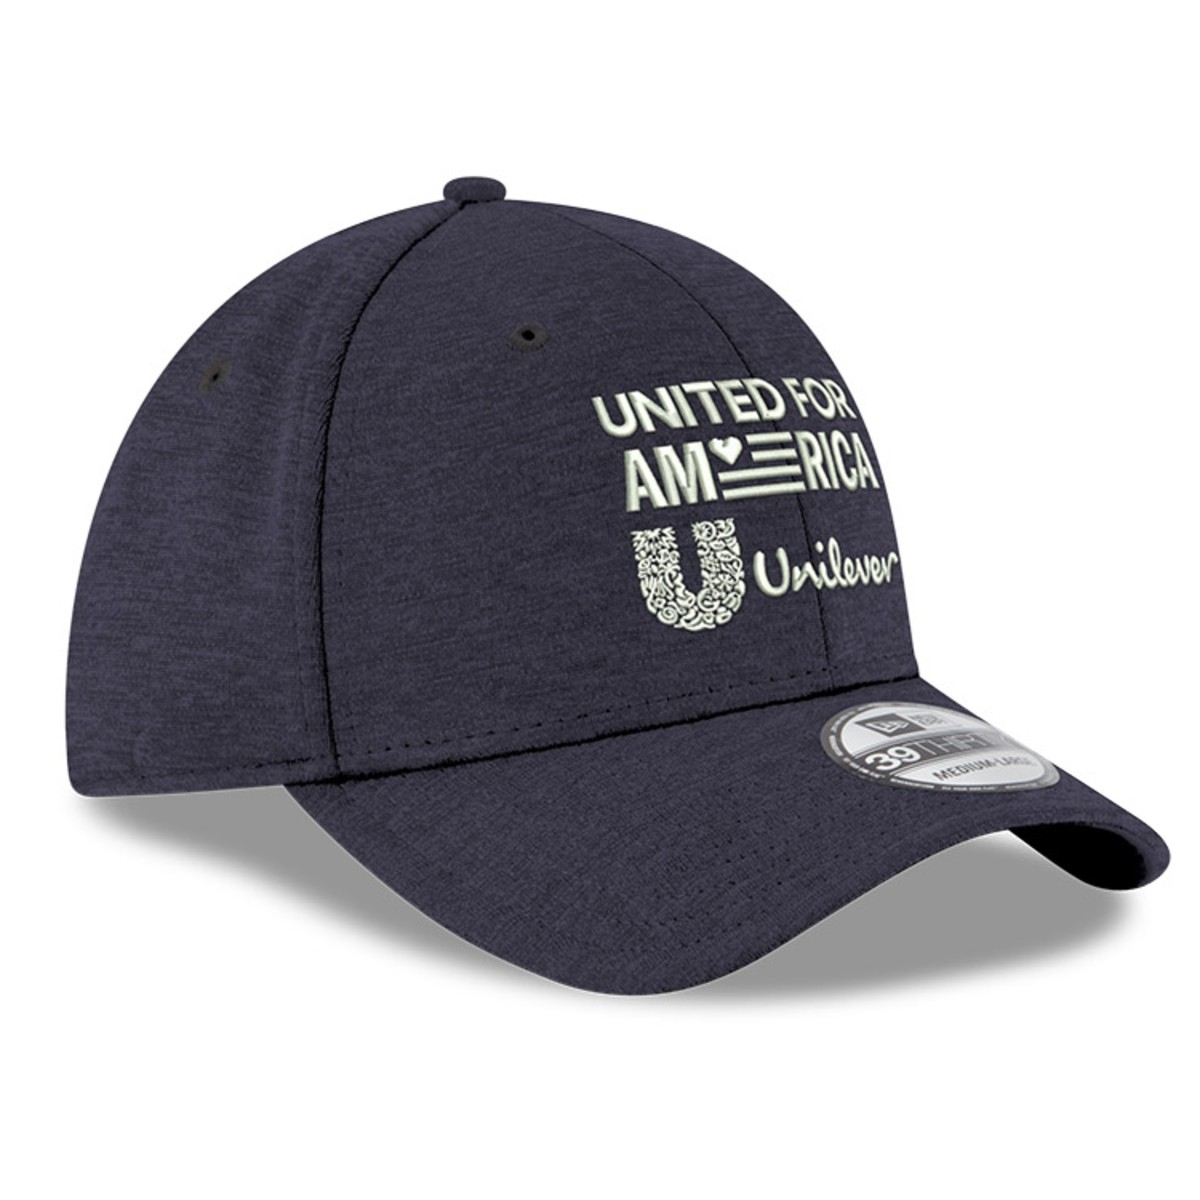 Dale JR 2021 3930 New Era United for America Hat